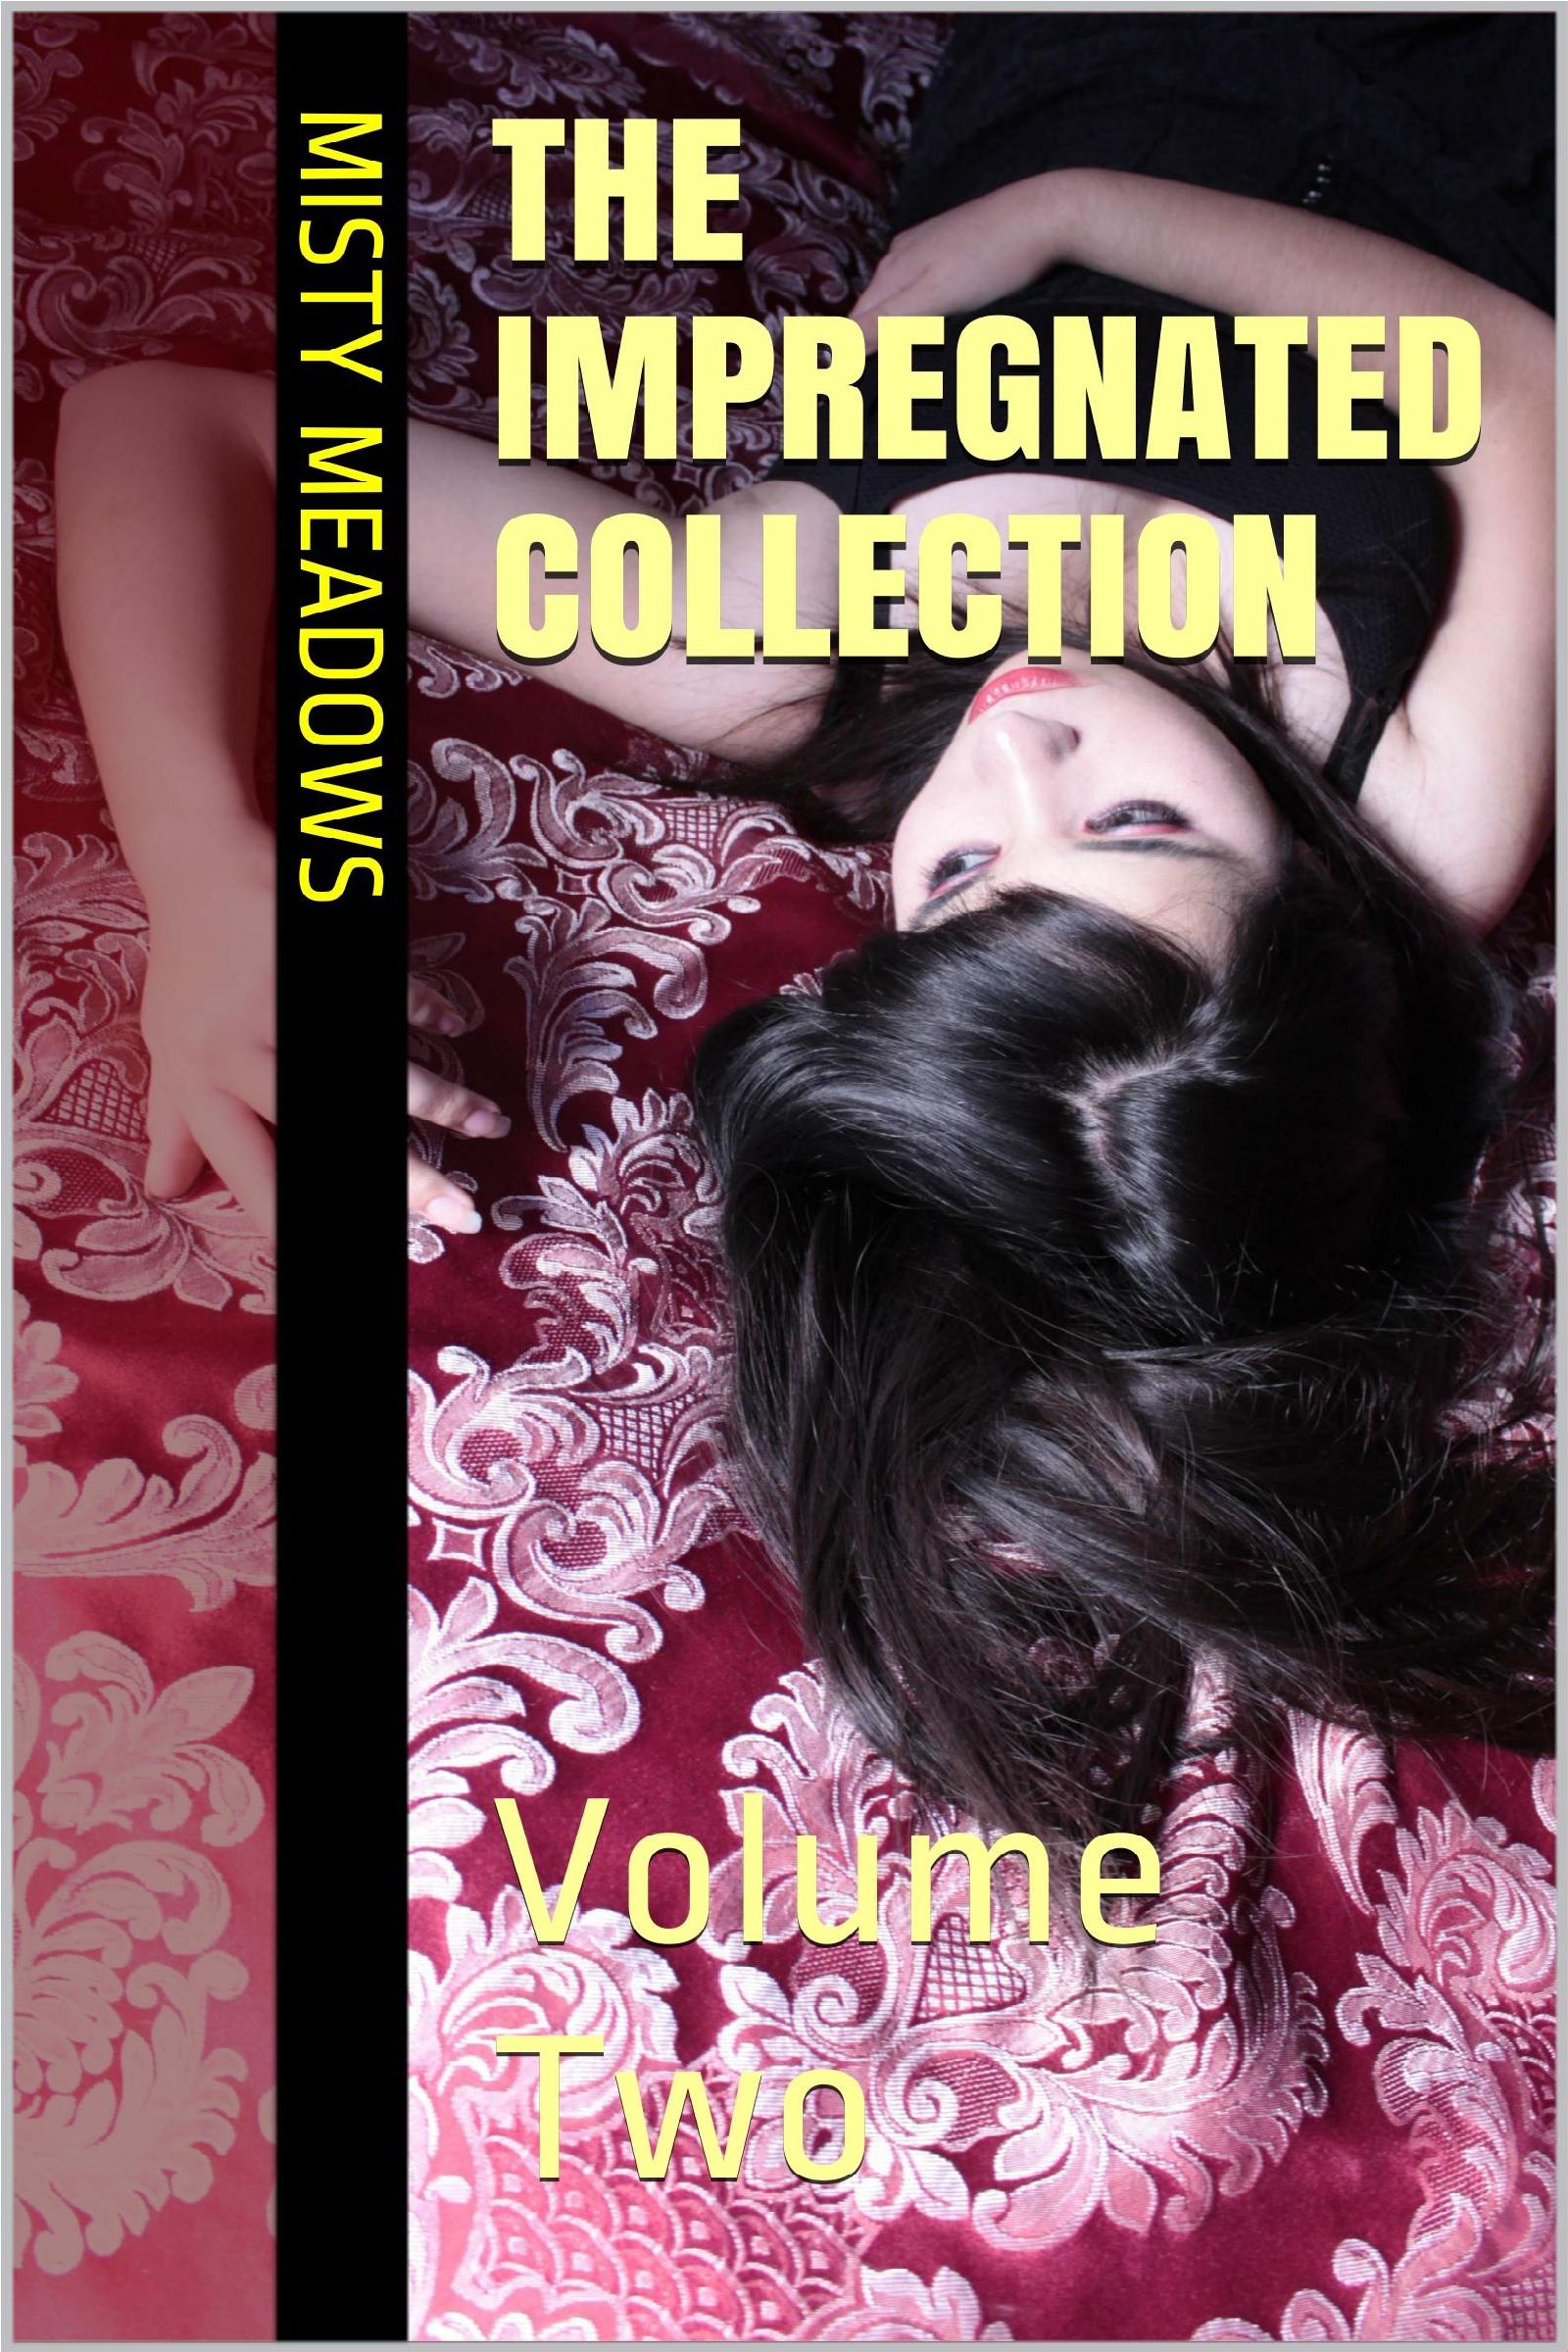 Impregnation pic sex picture